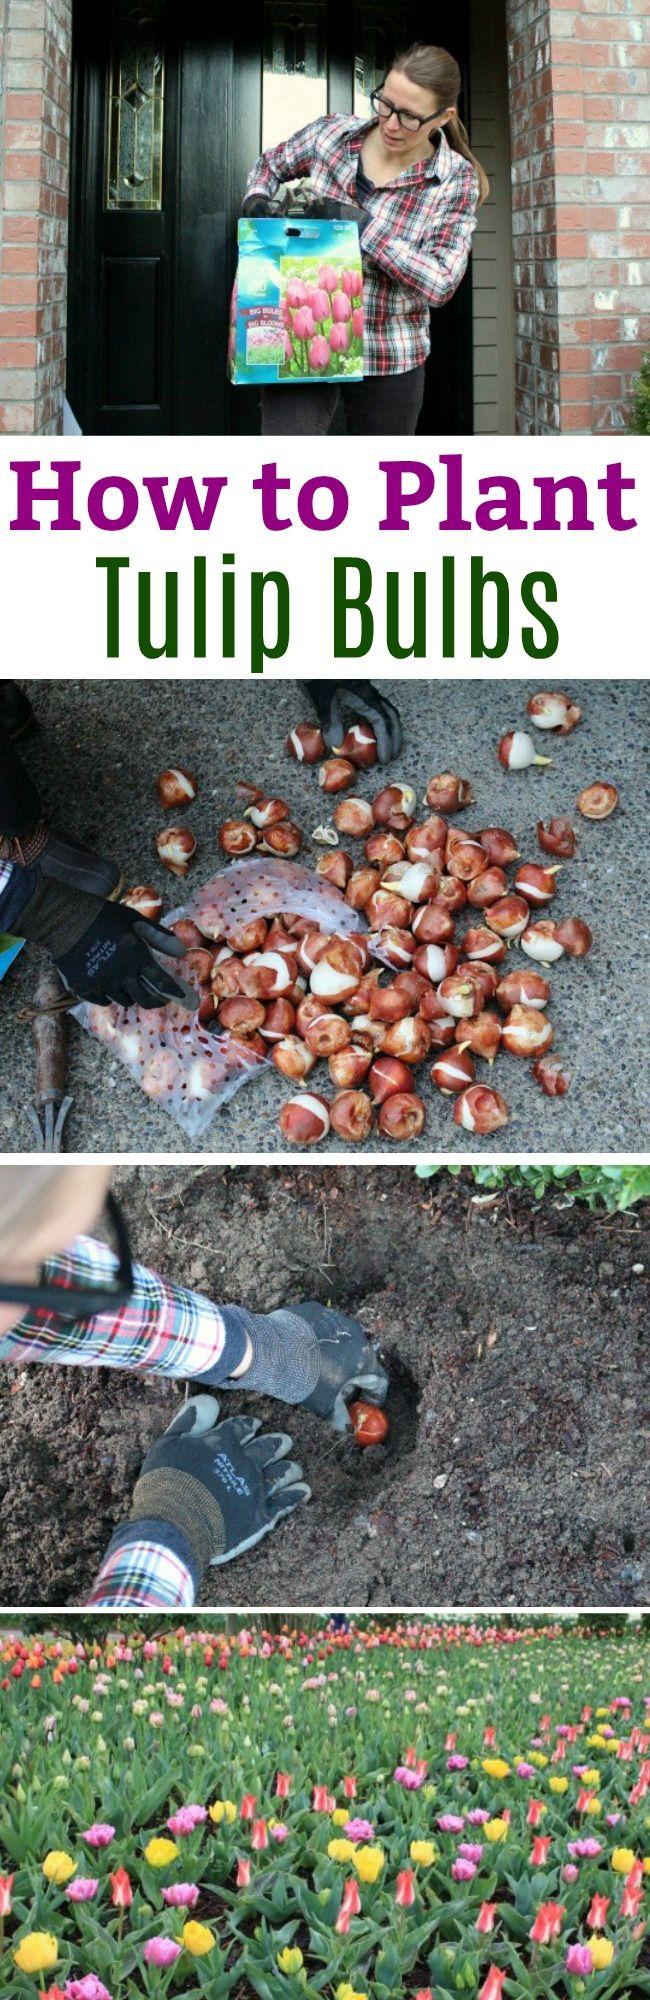 Tulip Tips, How to Plant Tulip Bulbs, Planting Tulips, Planting Bulbs